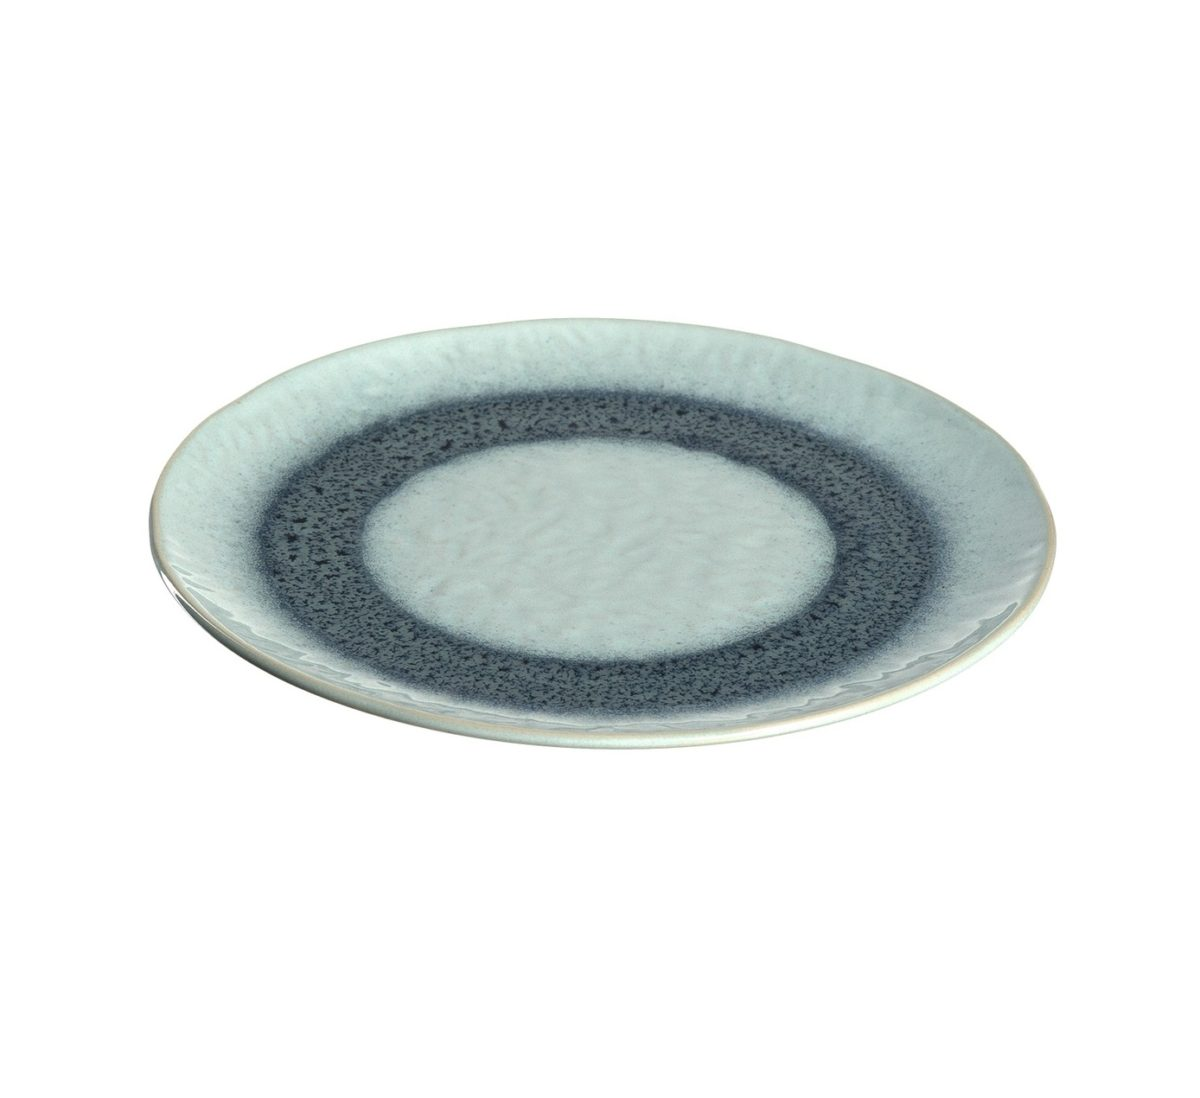 018544 matera gastronomie kaufhaus 1 1200x1098 - Farfurie ceramică Matera blue 23 cm (L018544)